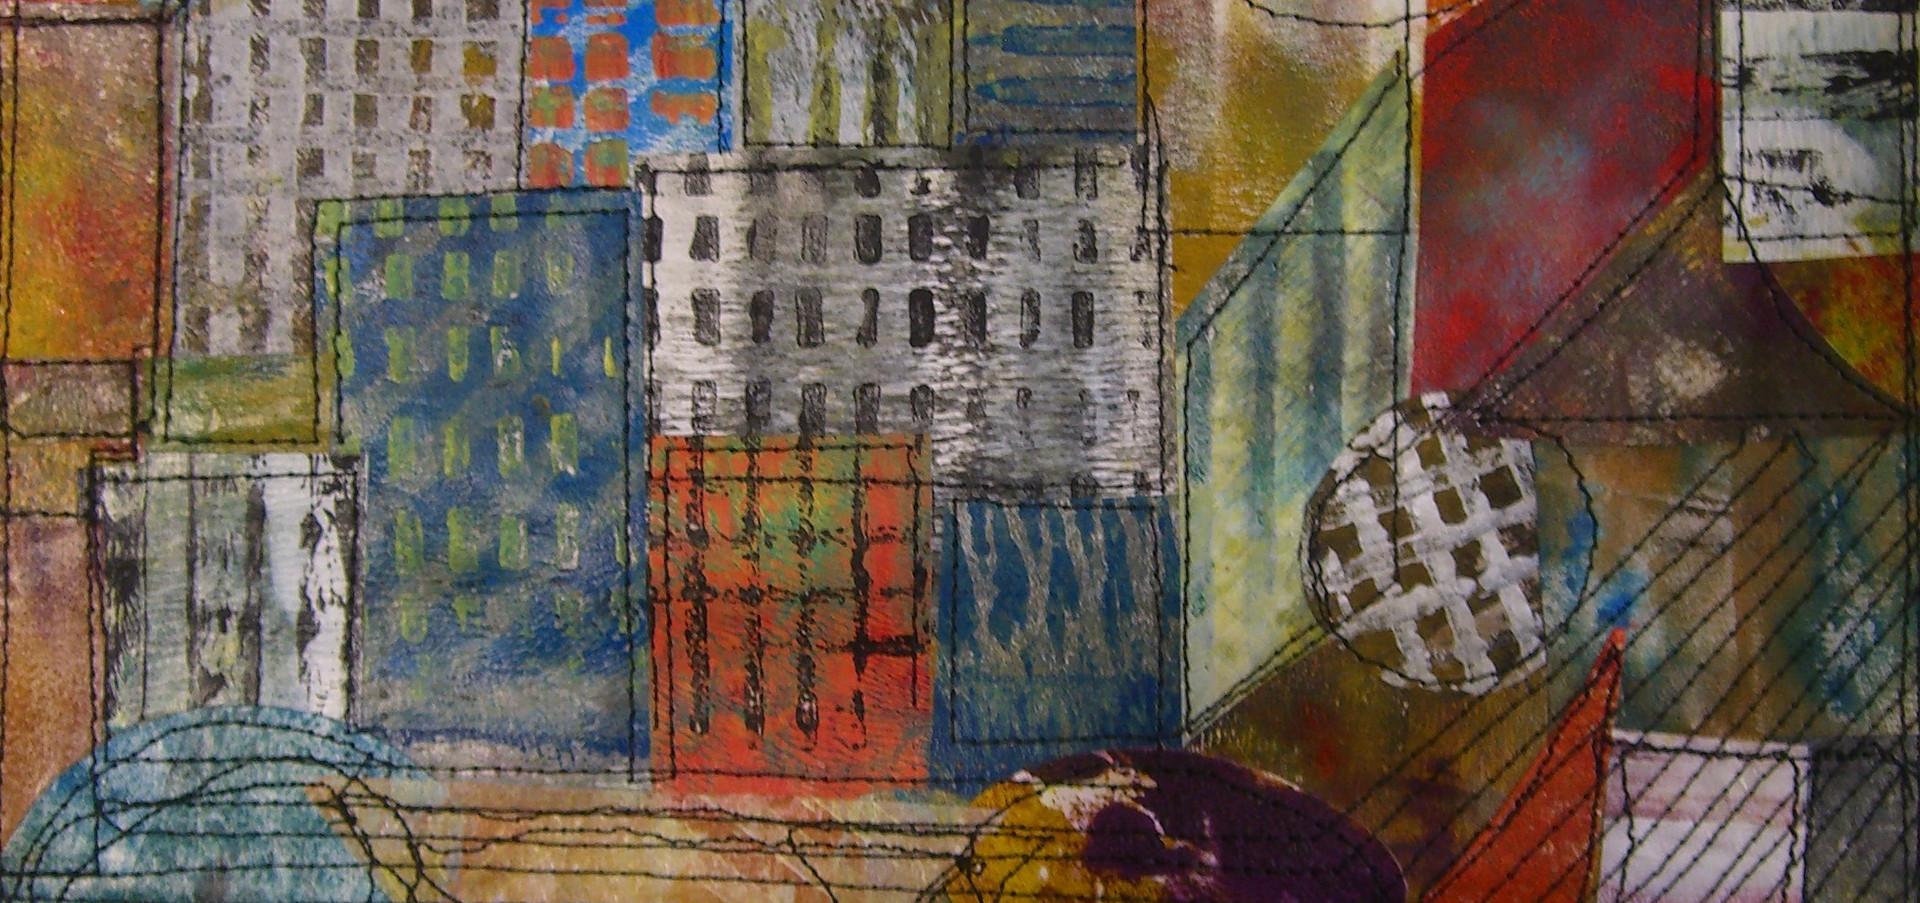 Painted Paper Quilt # 2